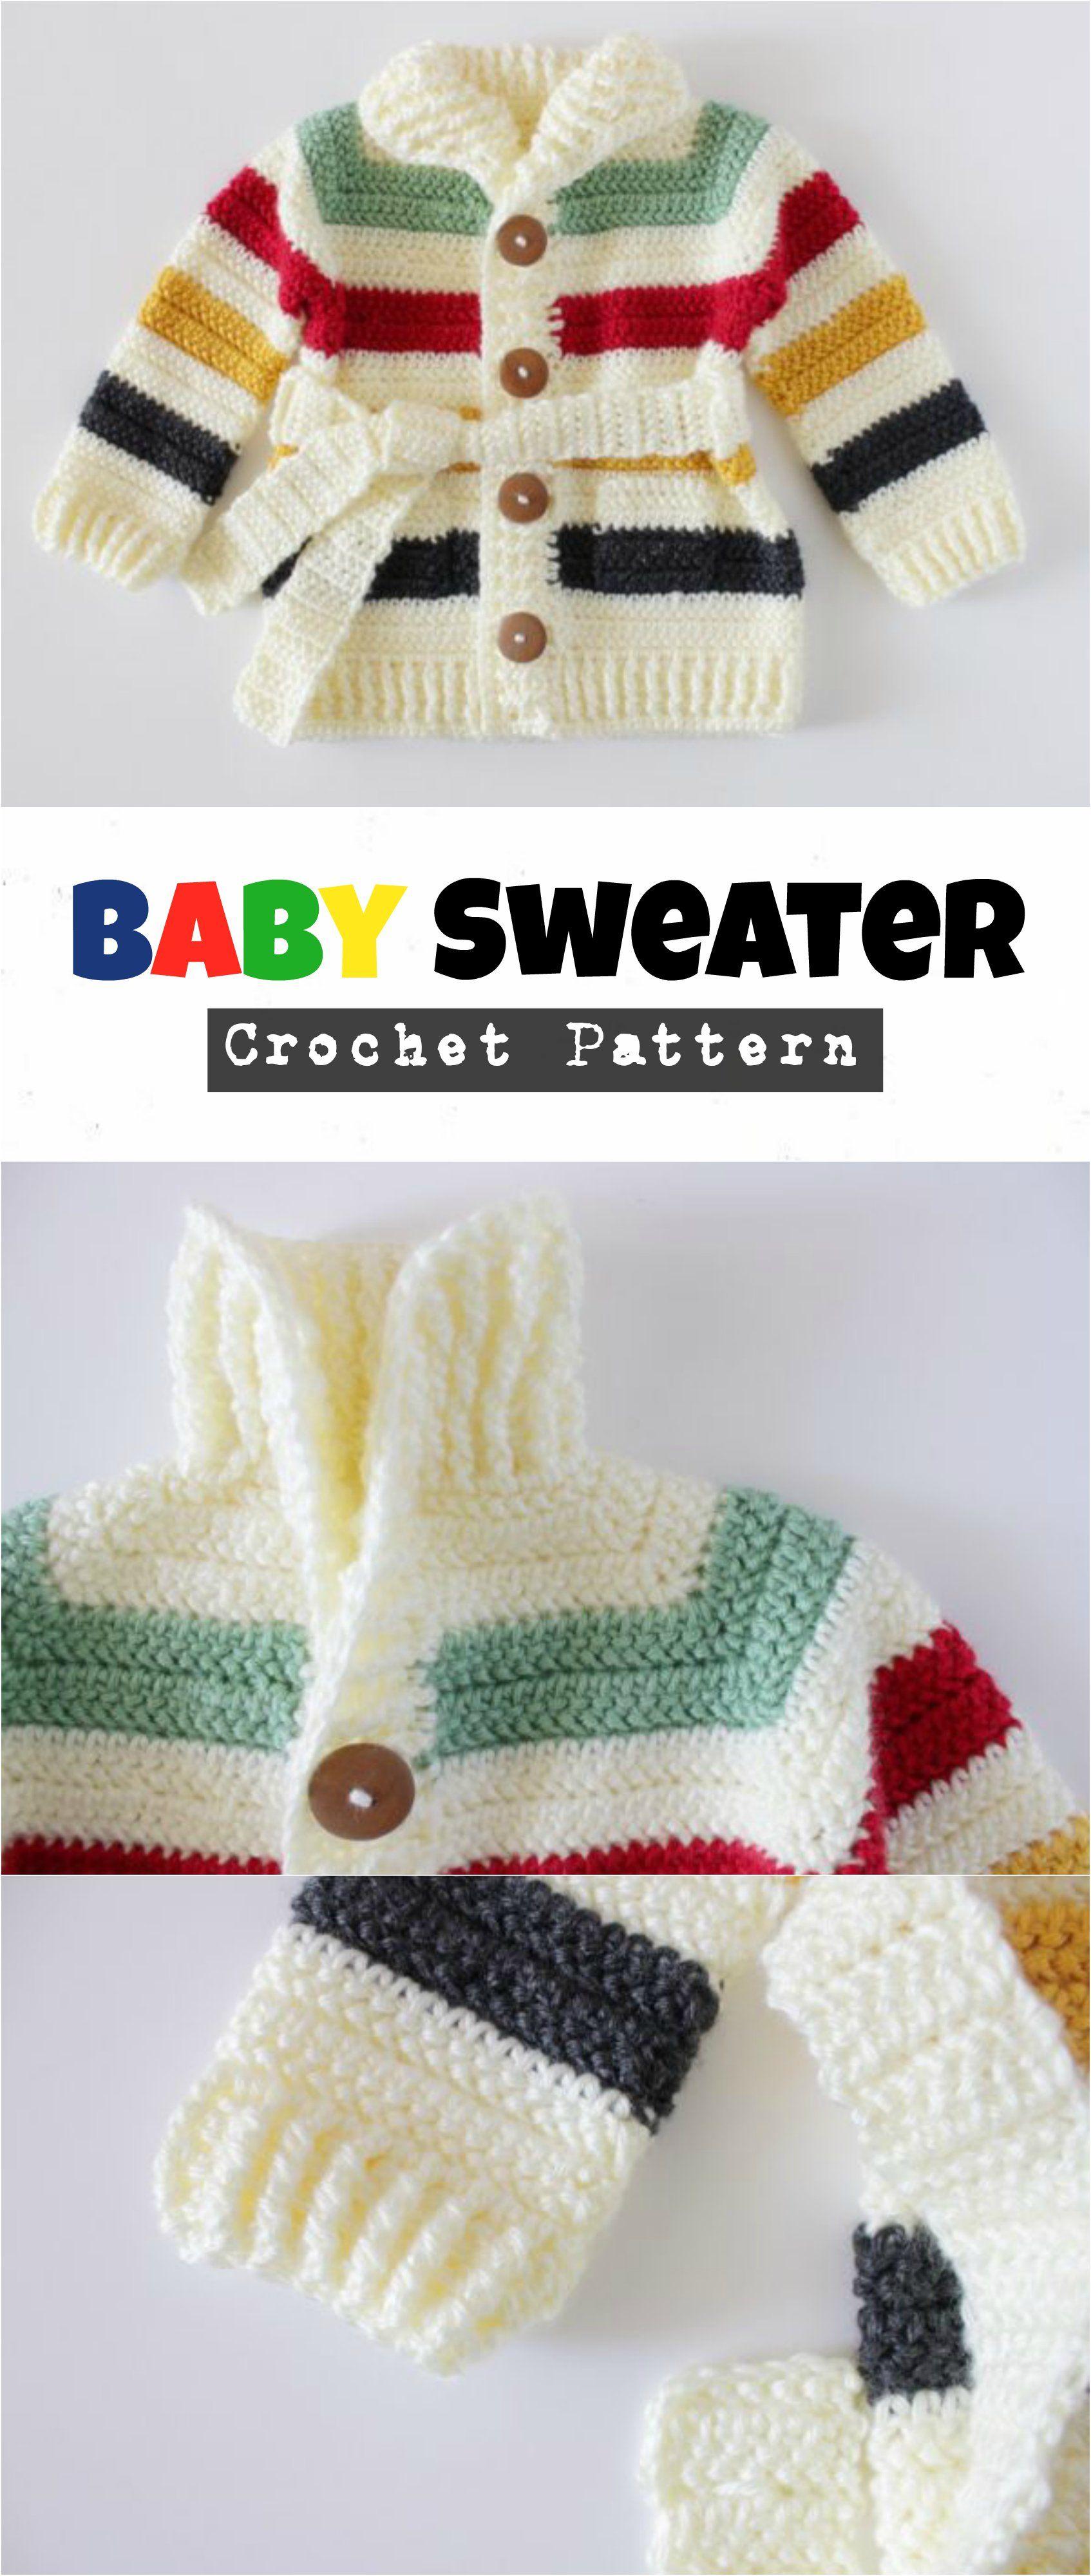 Crochet Baby Sweater | Bebé | Pinterest | Tejido, Bebé y Bebe